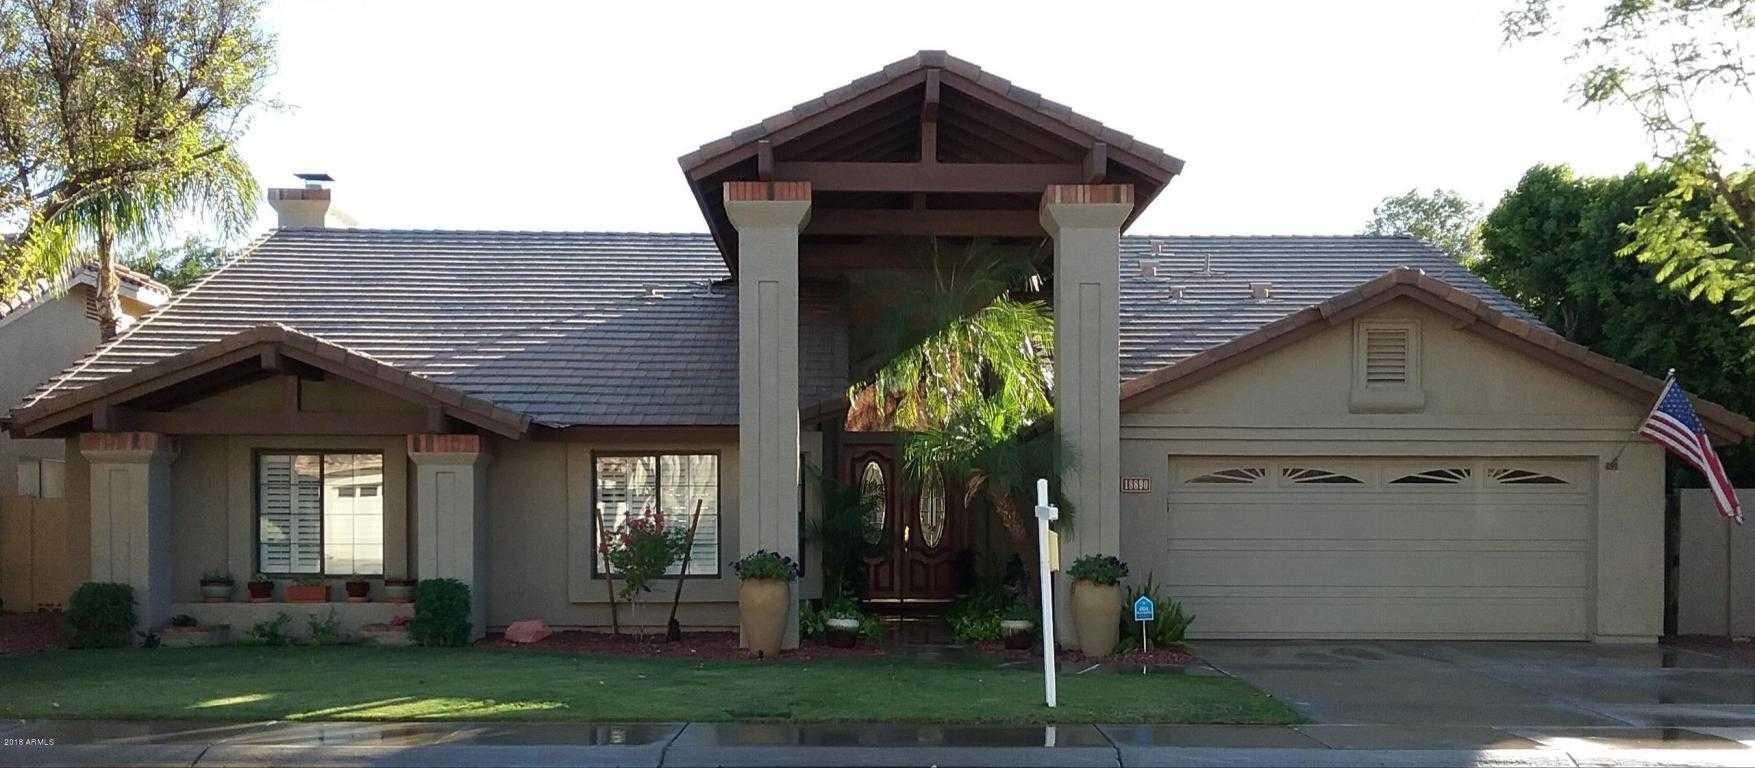 $389,900 - 4Br/2Ba - Home for Sale in Arrowhead Ranch 4 Lt 1-132 Tr A B, Glendale